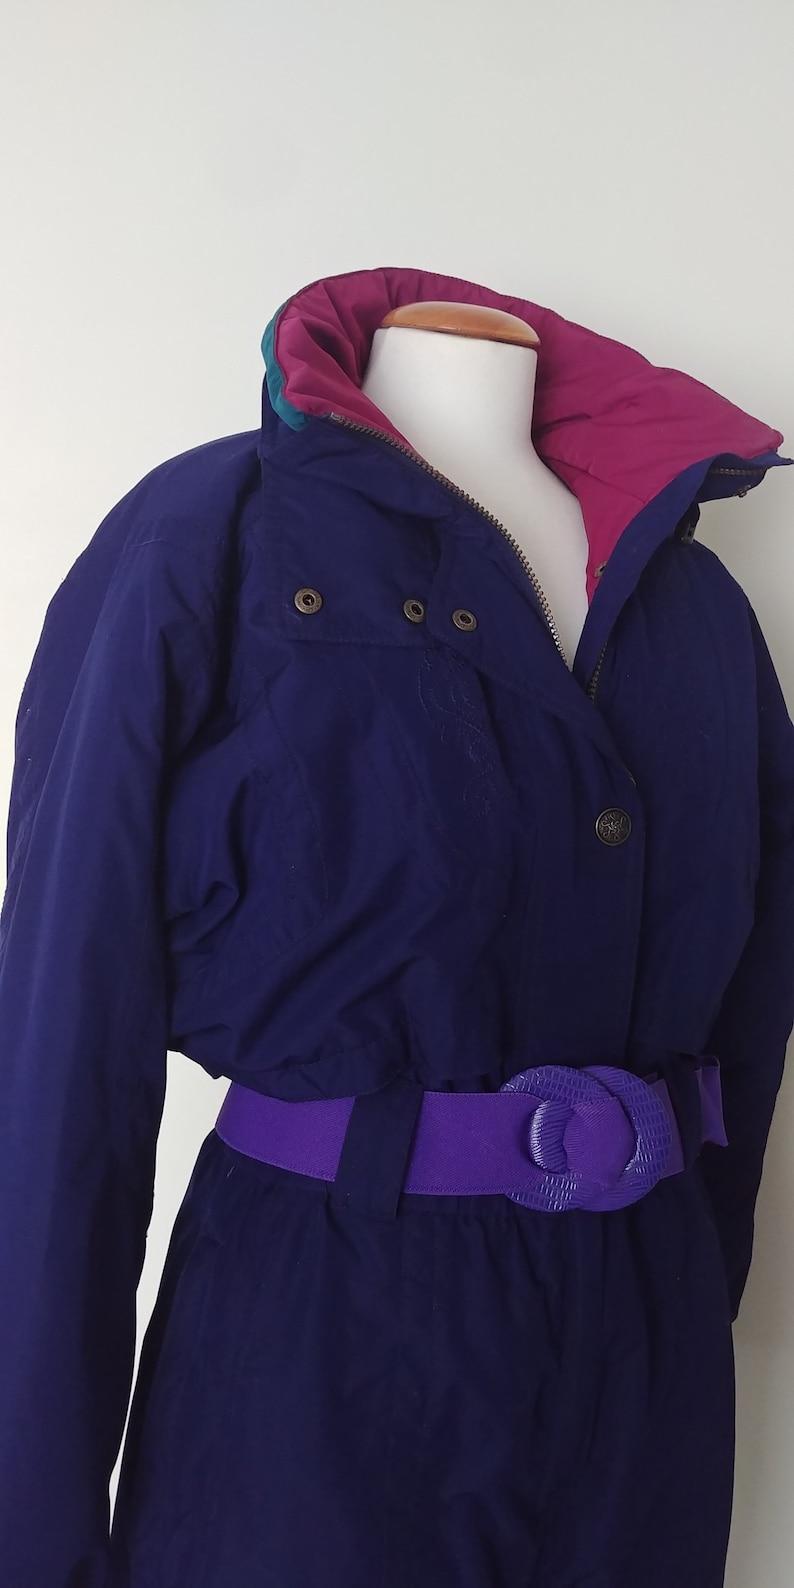 4d2a0cd1b04 Vintage 90s Nordica Ladies One Piece Ski Suit Retro Nineties